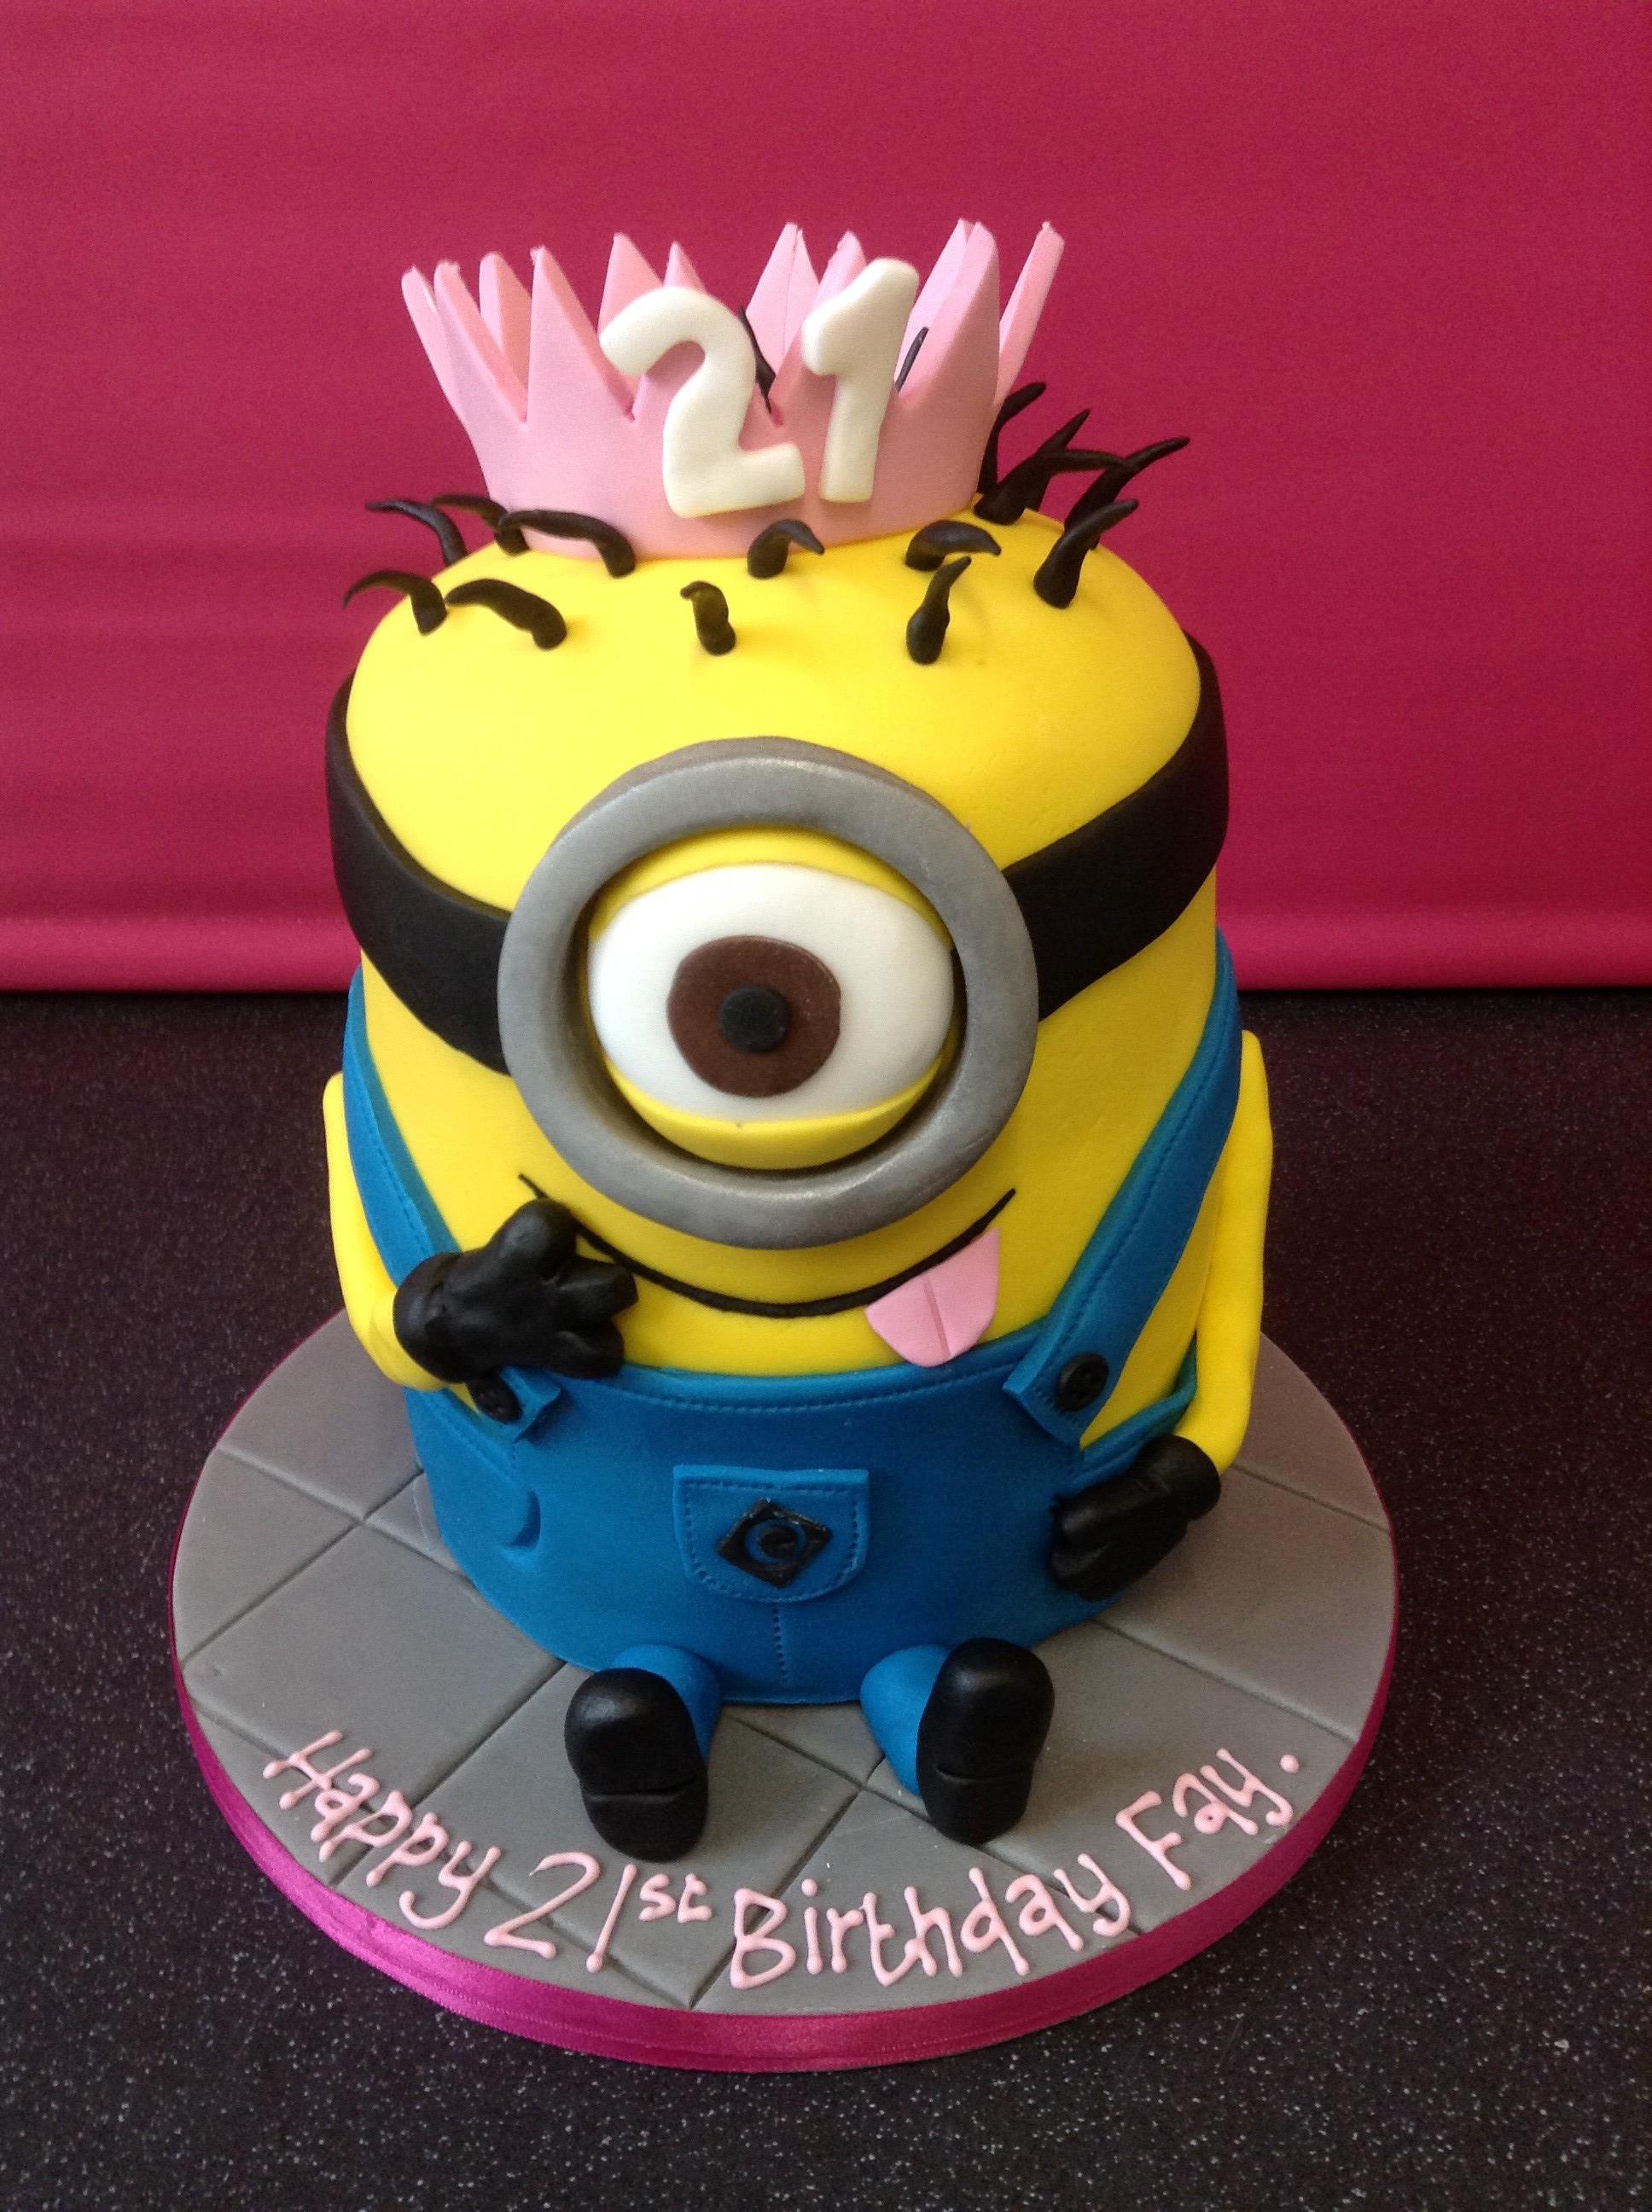 Adult Birthday Cakes Leeds The Little Cake Cottage